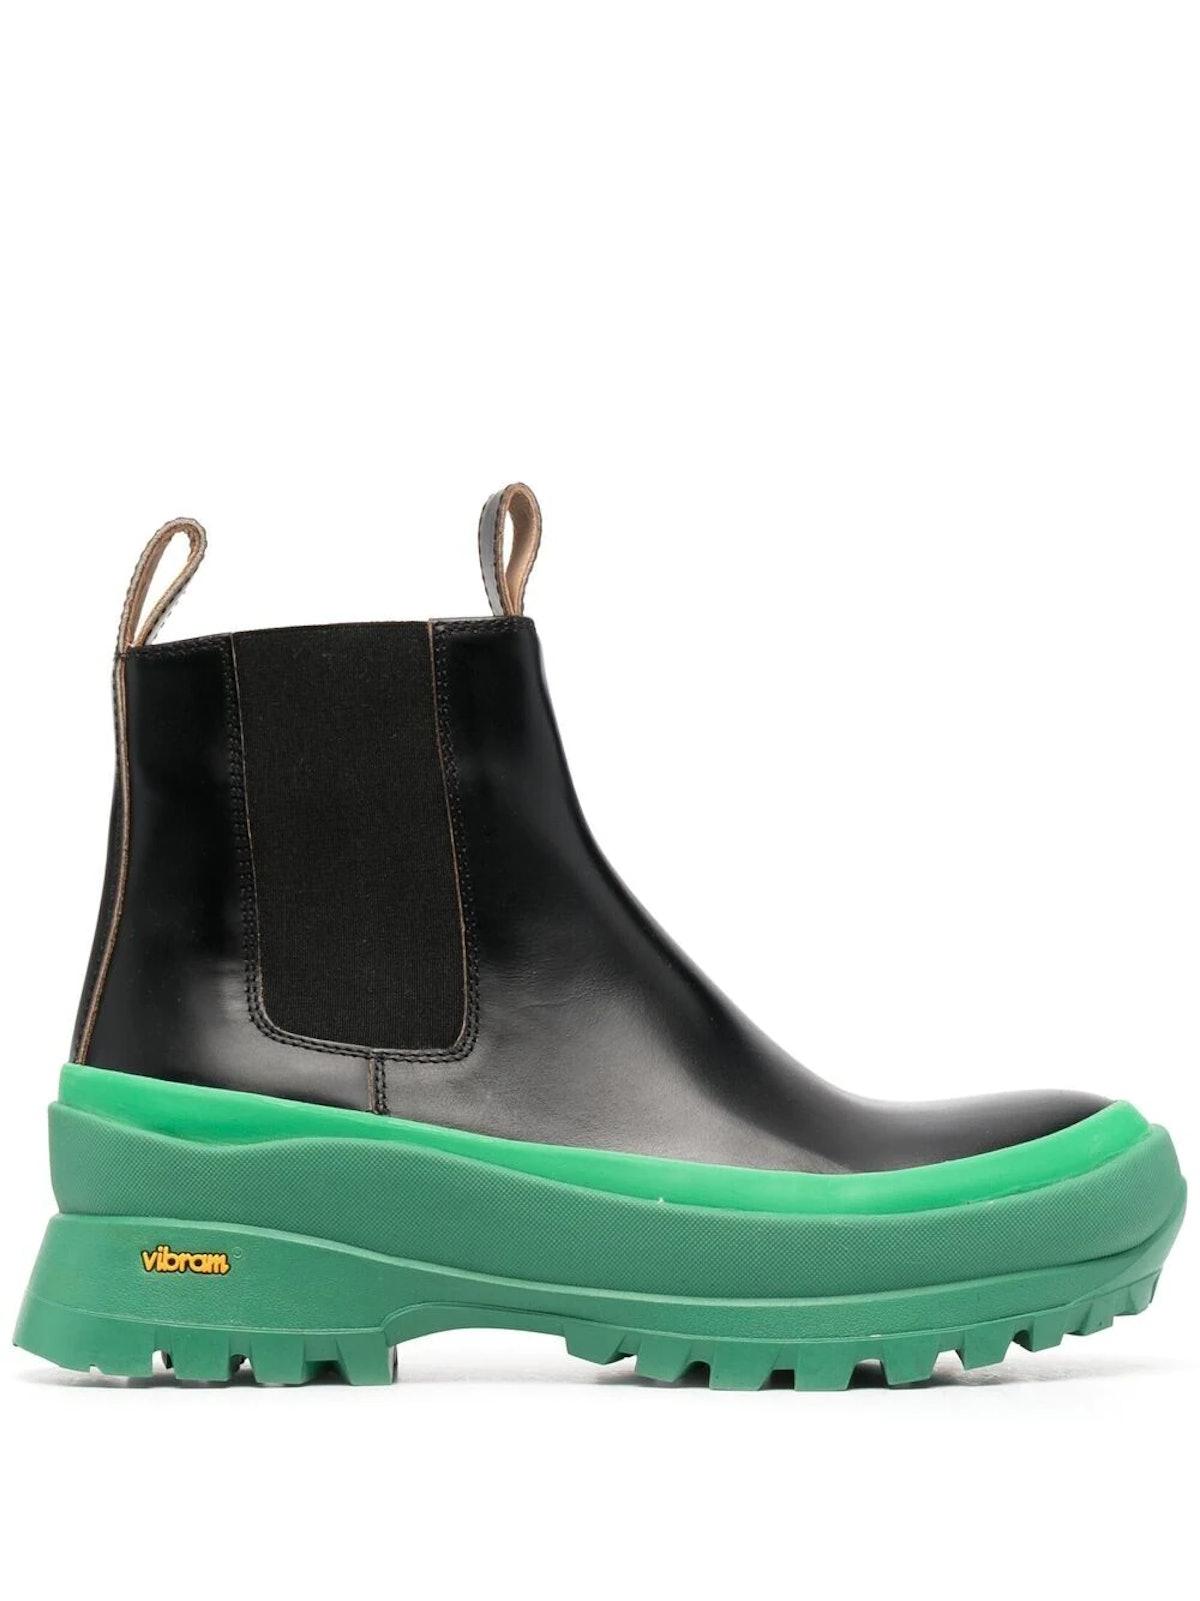 Galosh Sole Boots